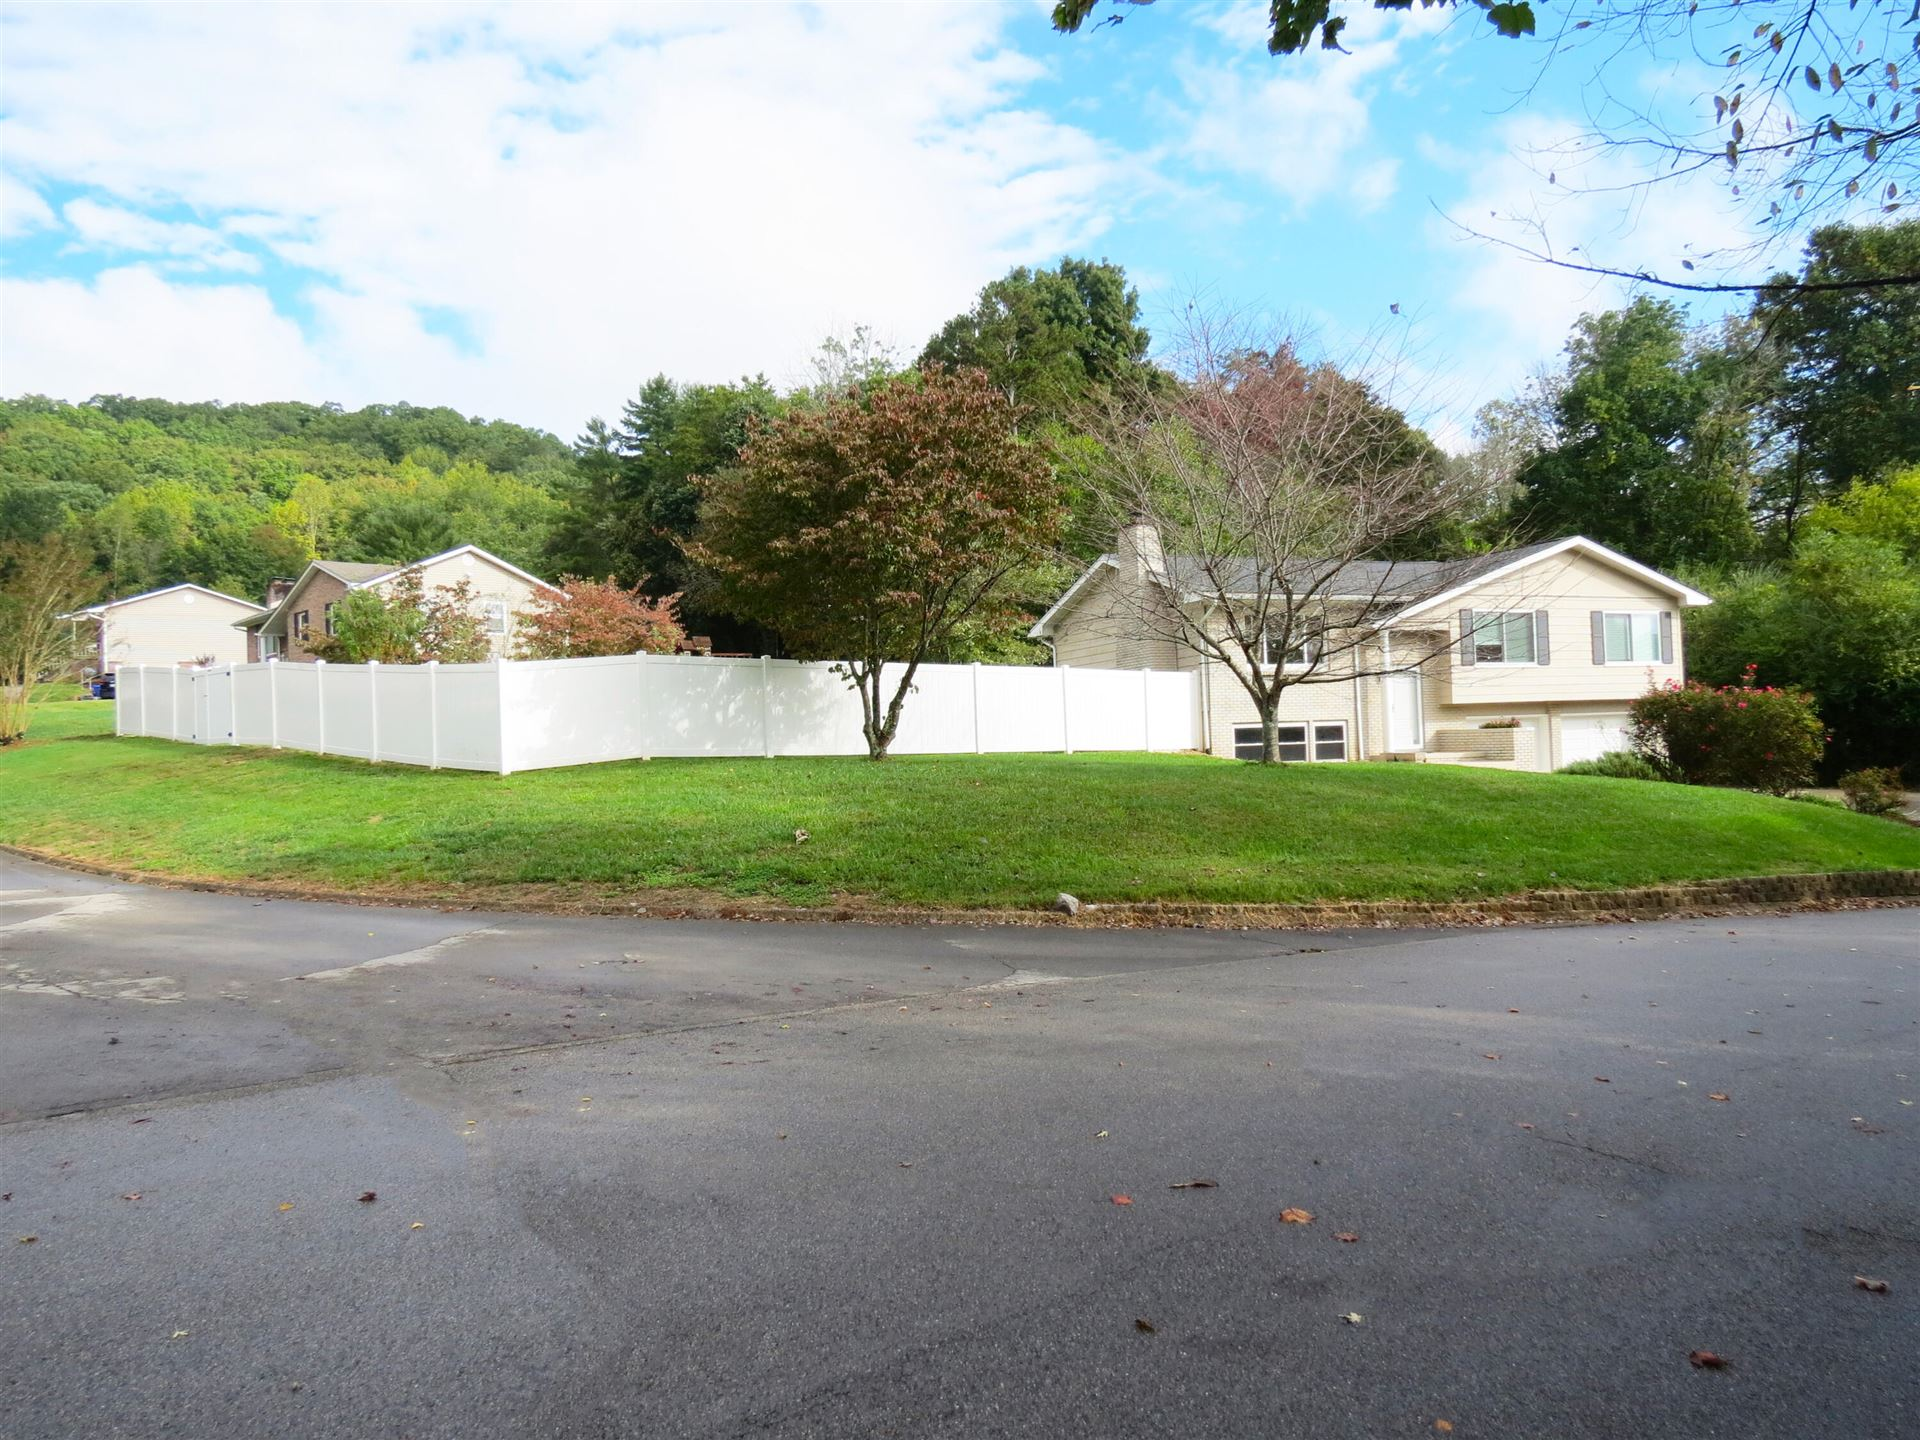 Photo of 232 Tusculum Drive, Oak Ridge, TN 37830 (MLS # 1169792)